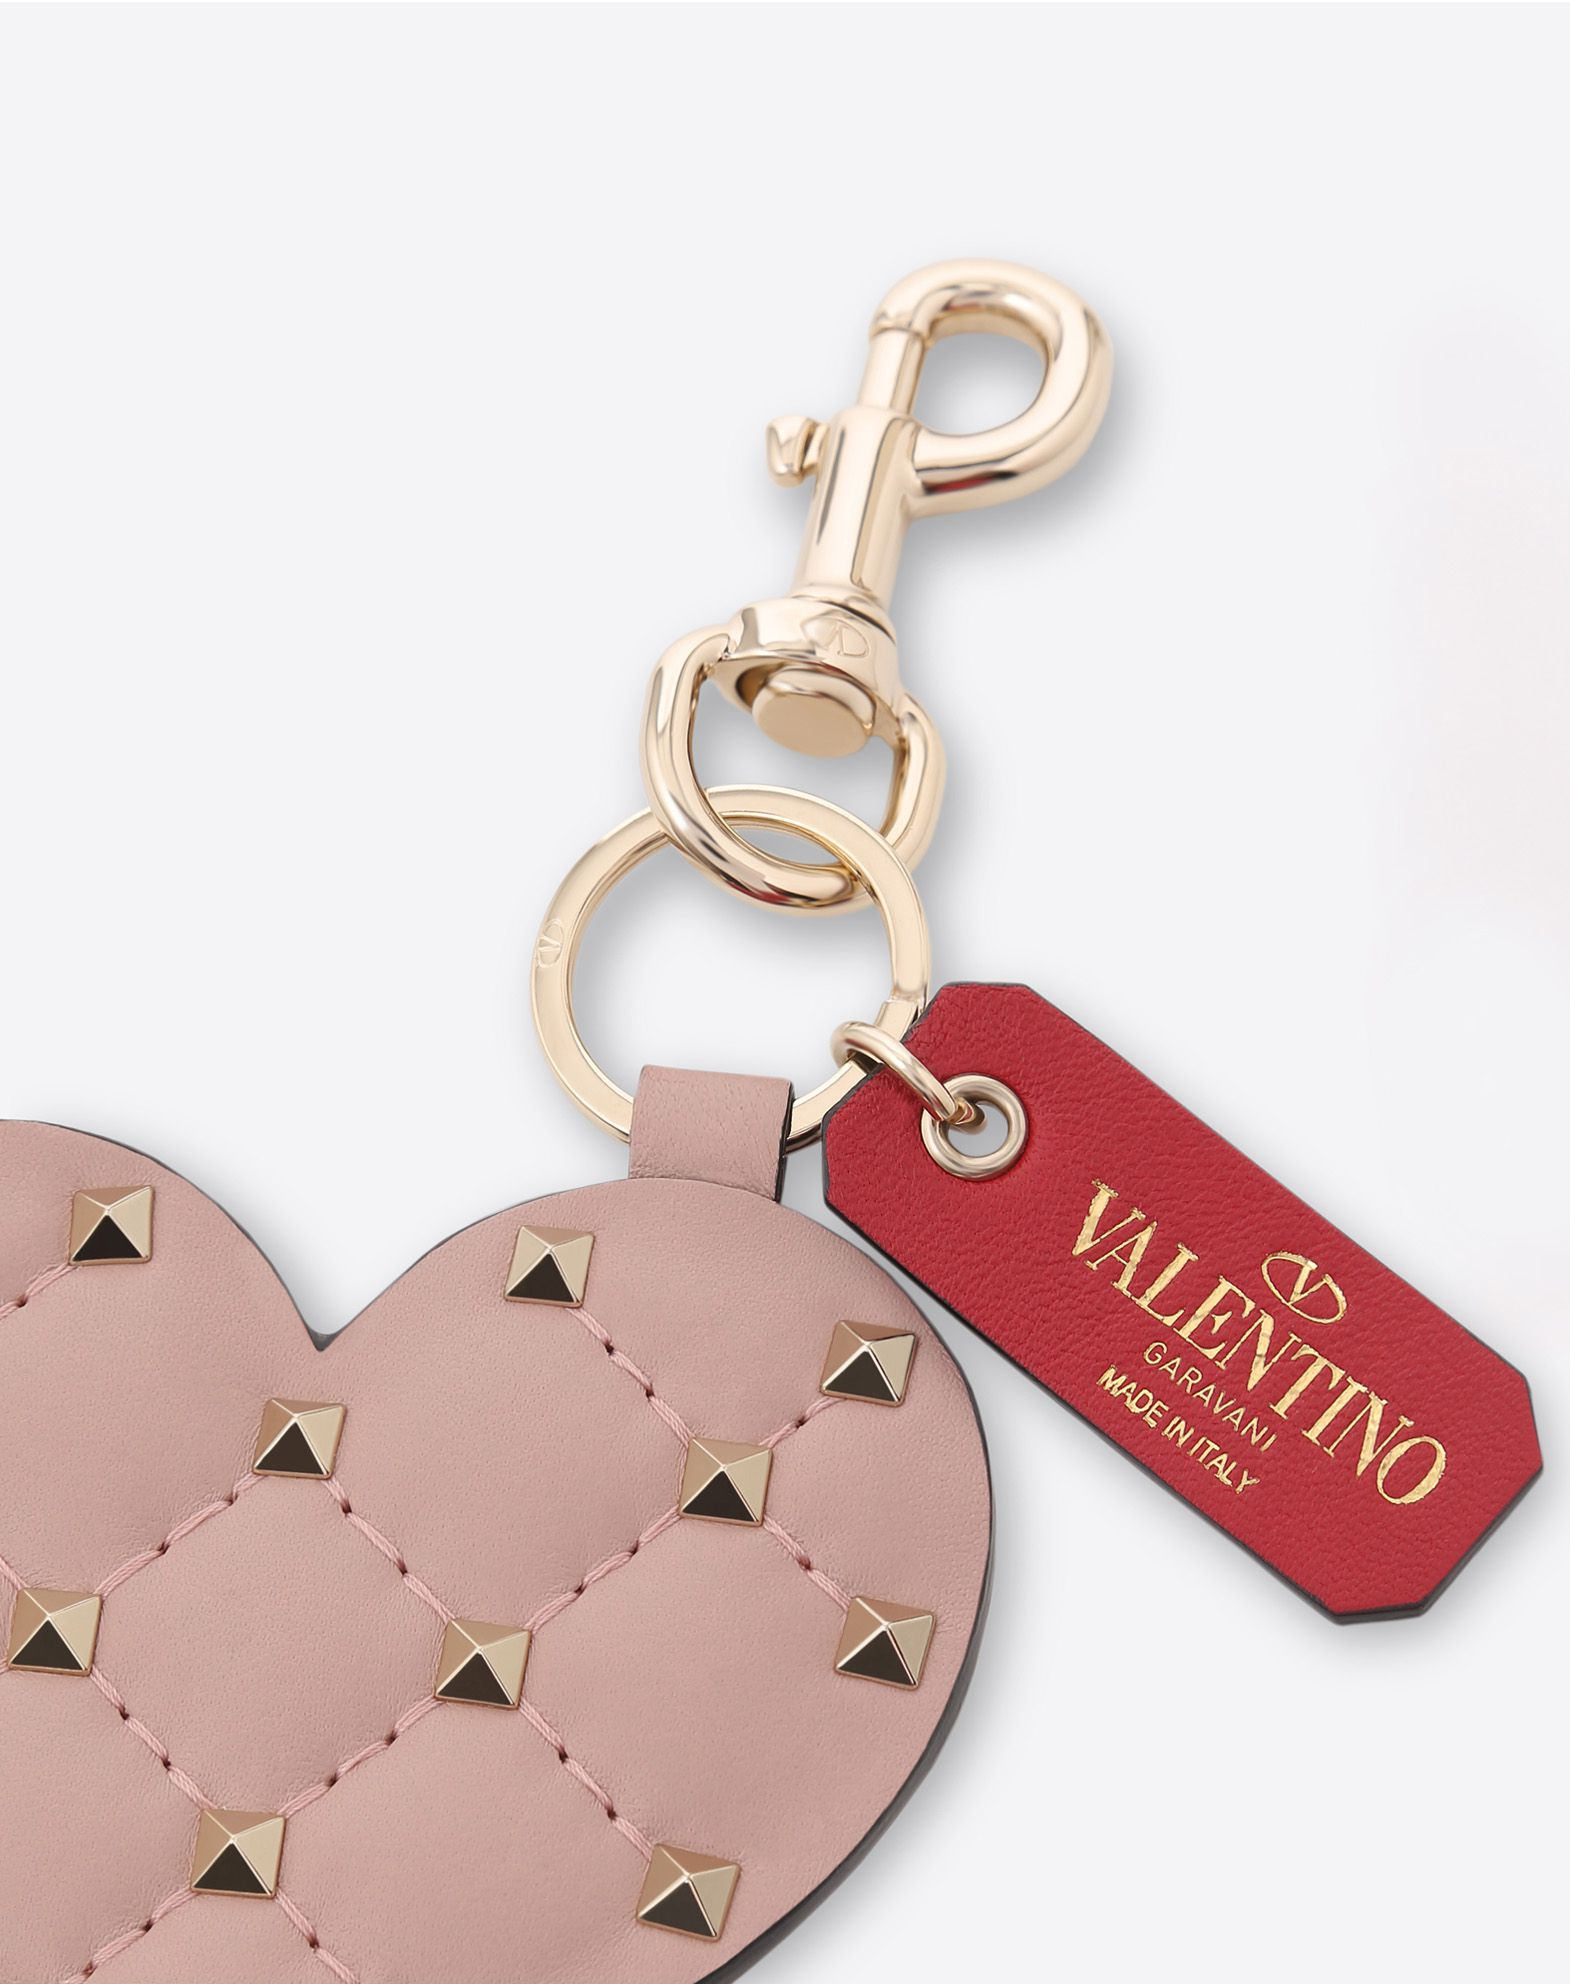 Valentino Garavani Rockstud Spike heart keychain - Pink & Purple Valentino 80FX2jlDe